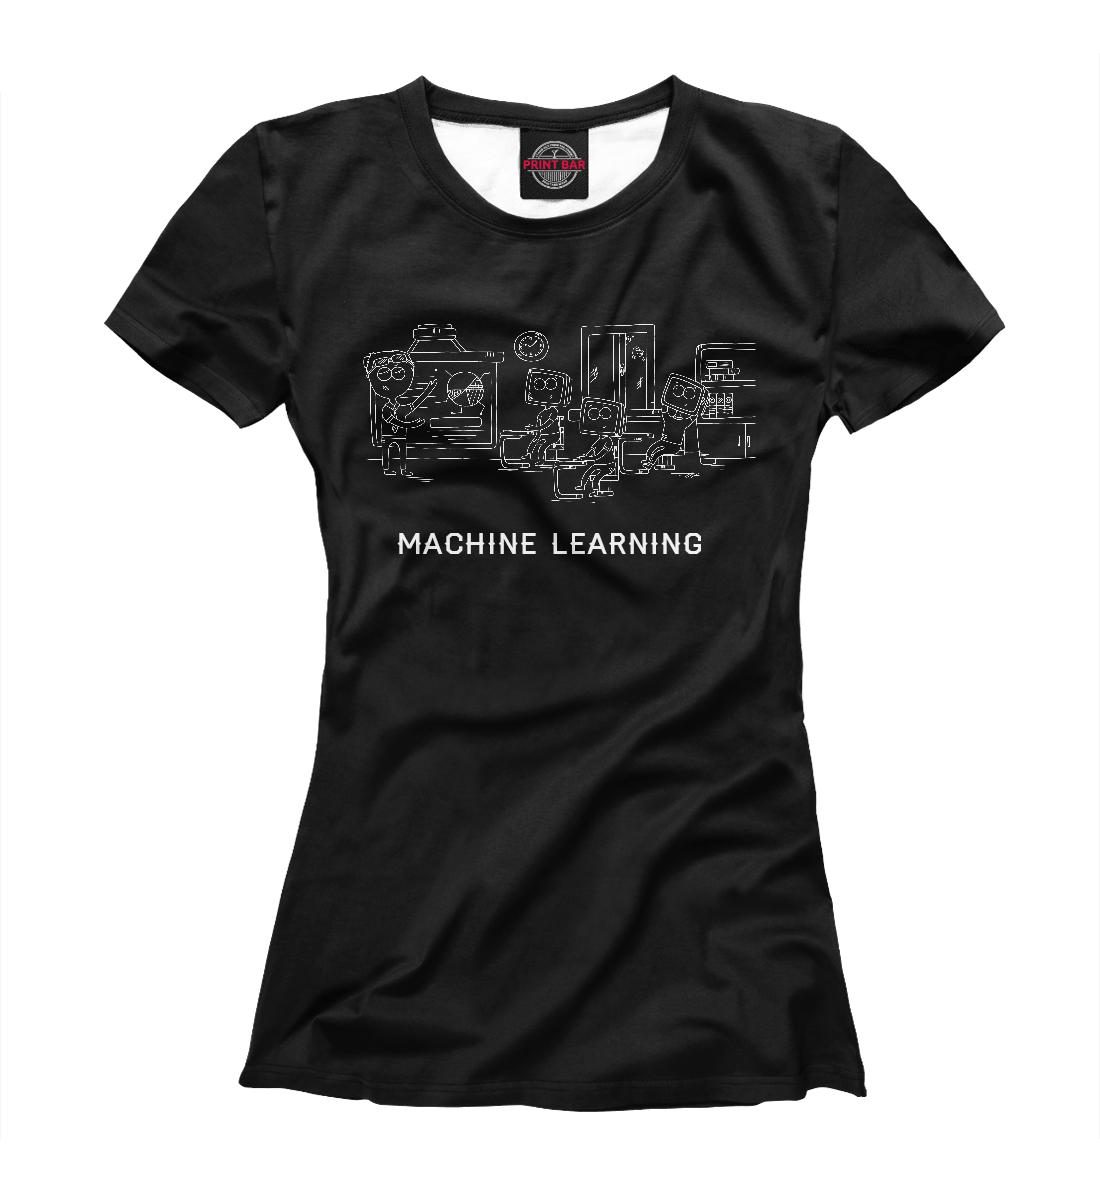 Фото - Machine learning paolo perrotta machine learning für softwareentwickler